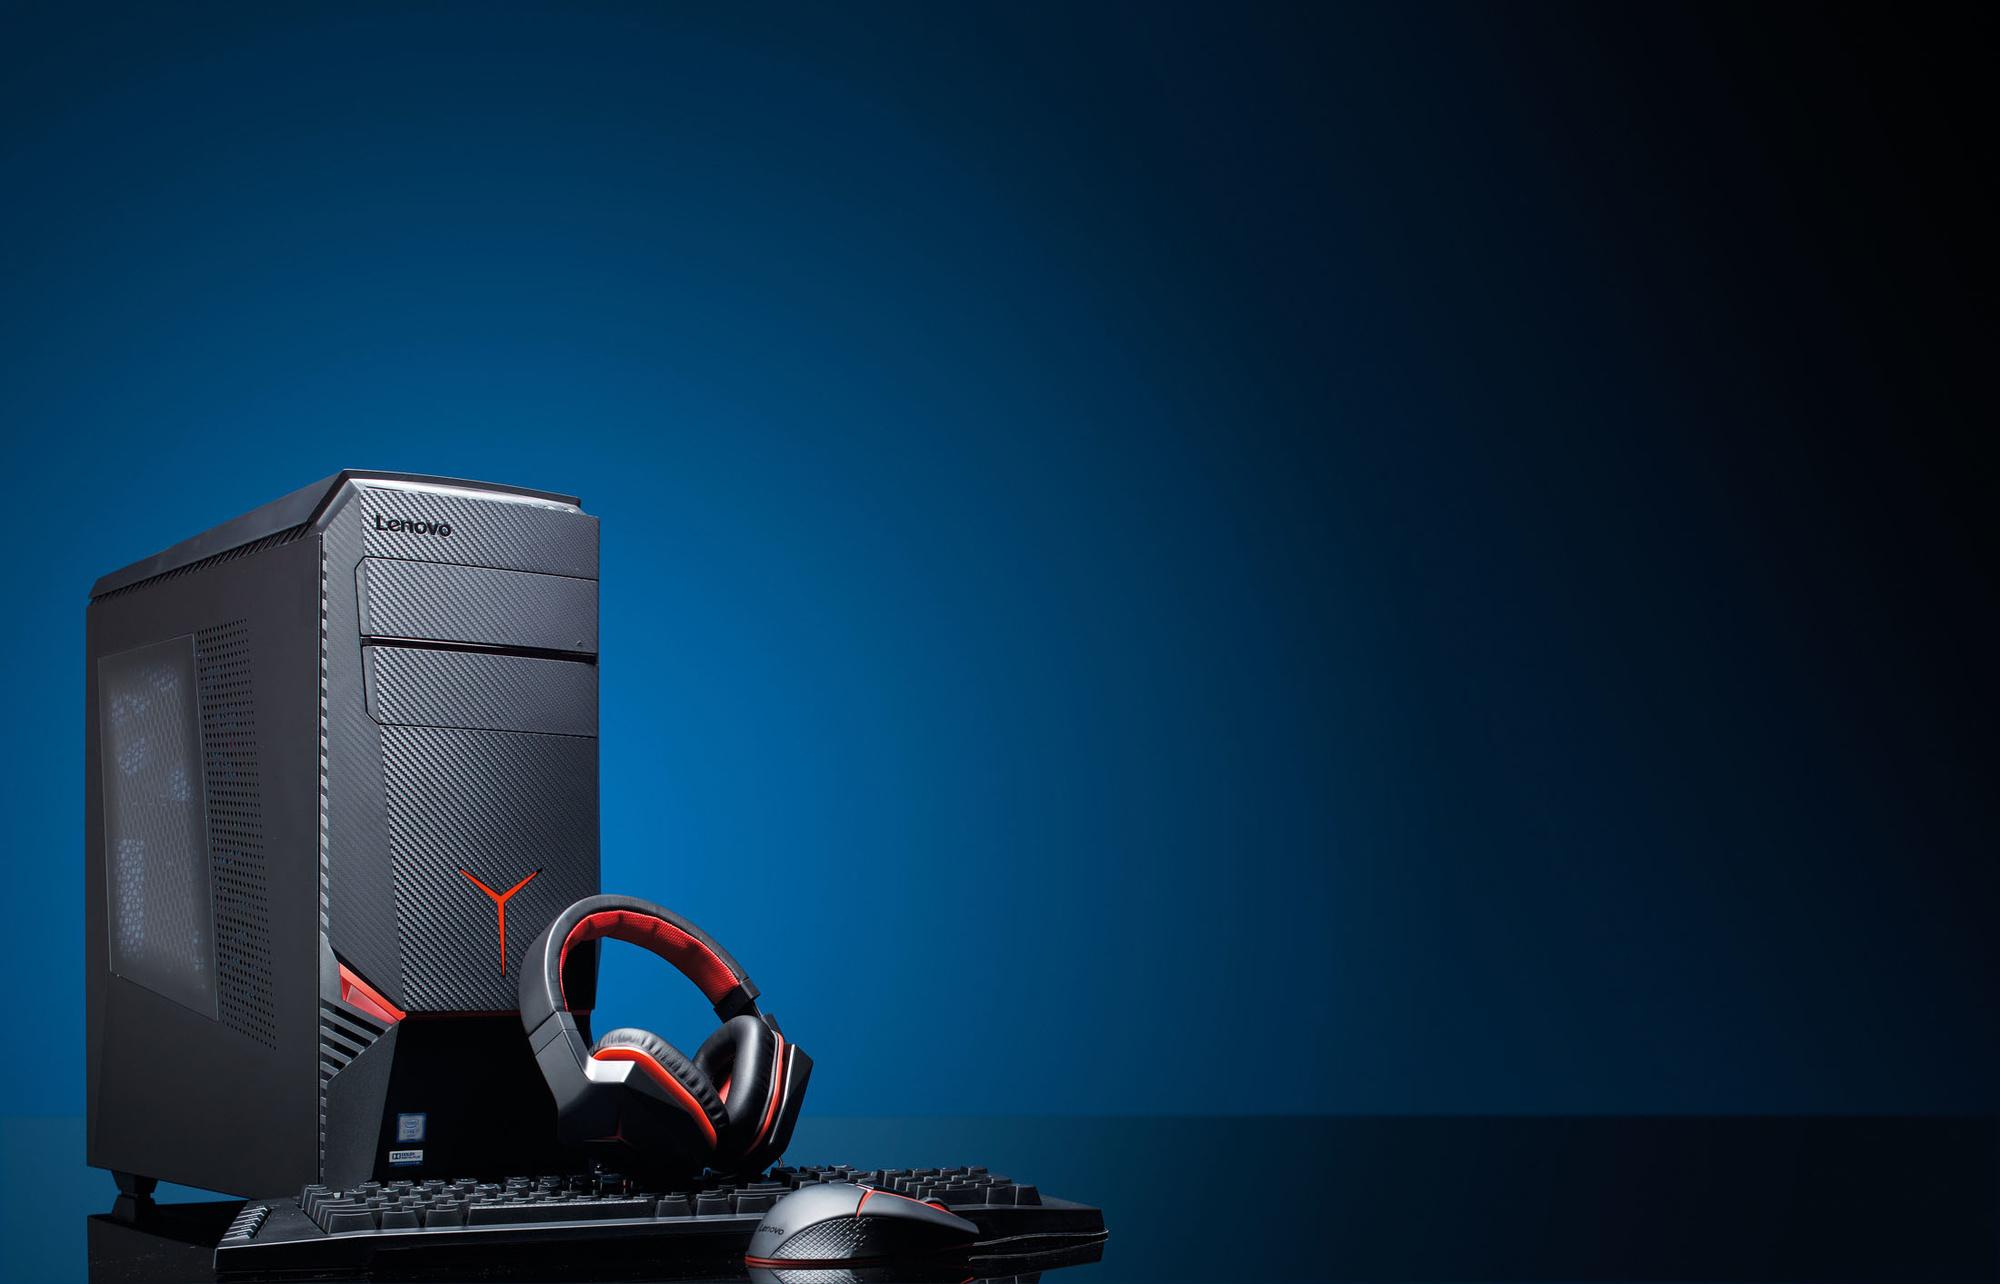 Lenovo Ideacenter Y900 pc (2016), Getty Images